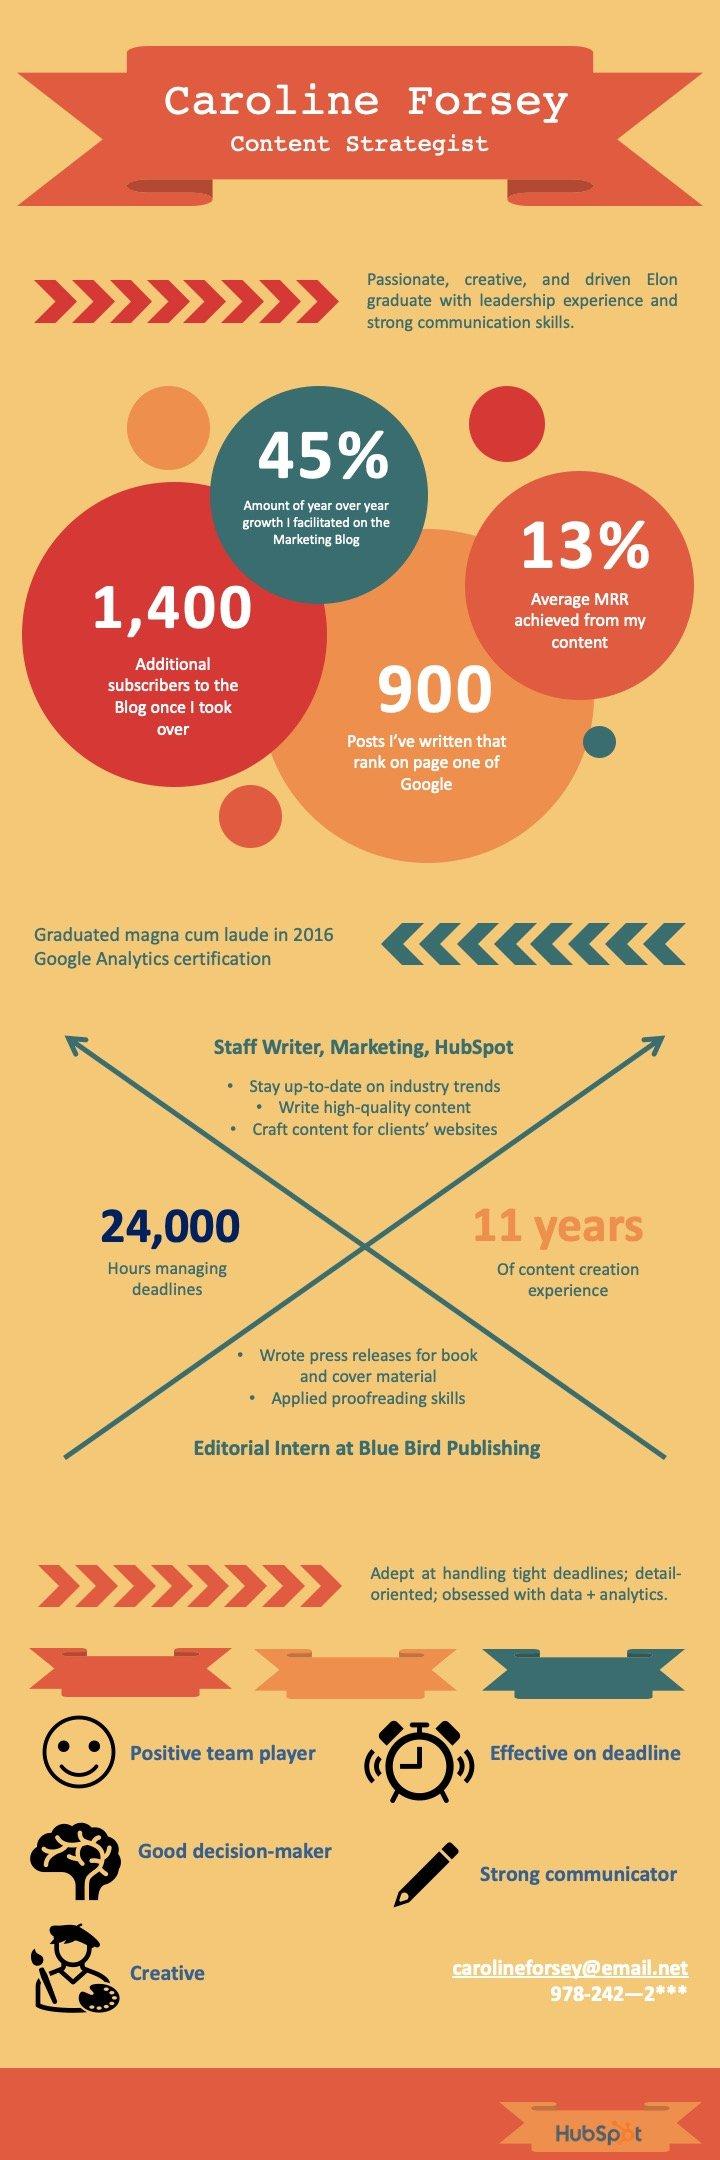 Infographic resume example 2